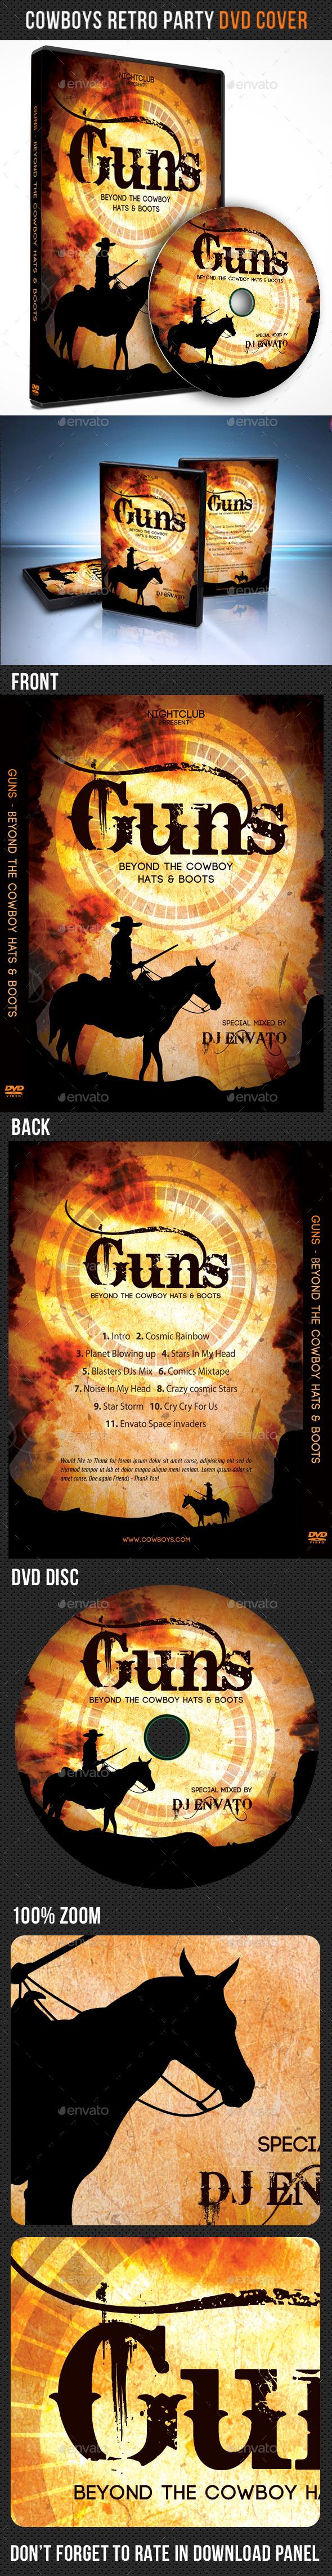 Cowboys Retro Party DVD Cover Template - CD & DVD Artwork Print Templates